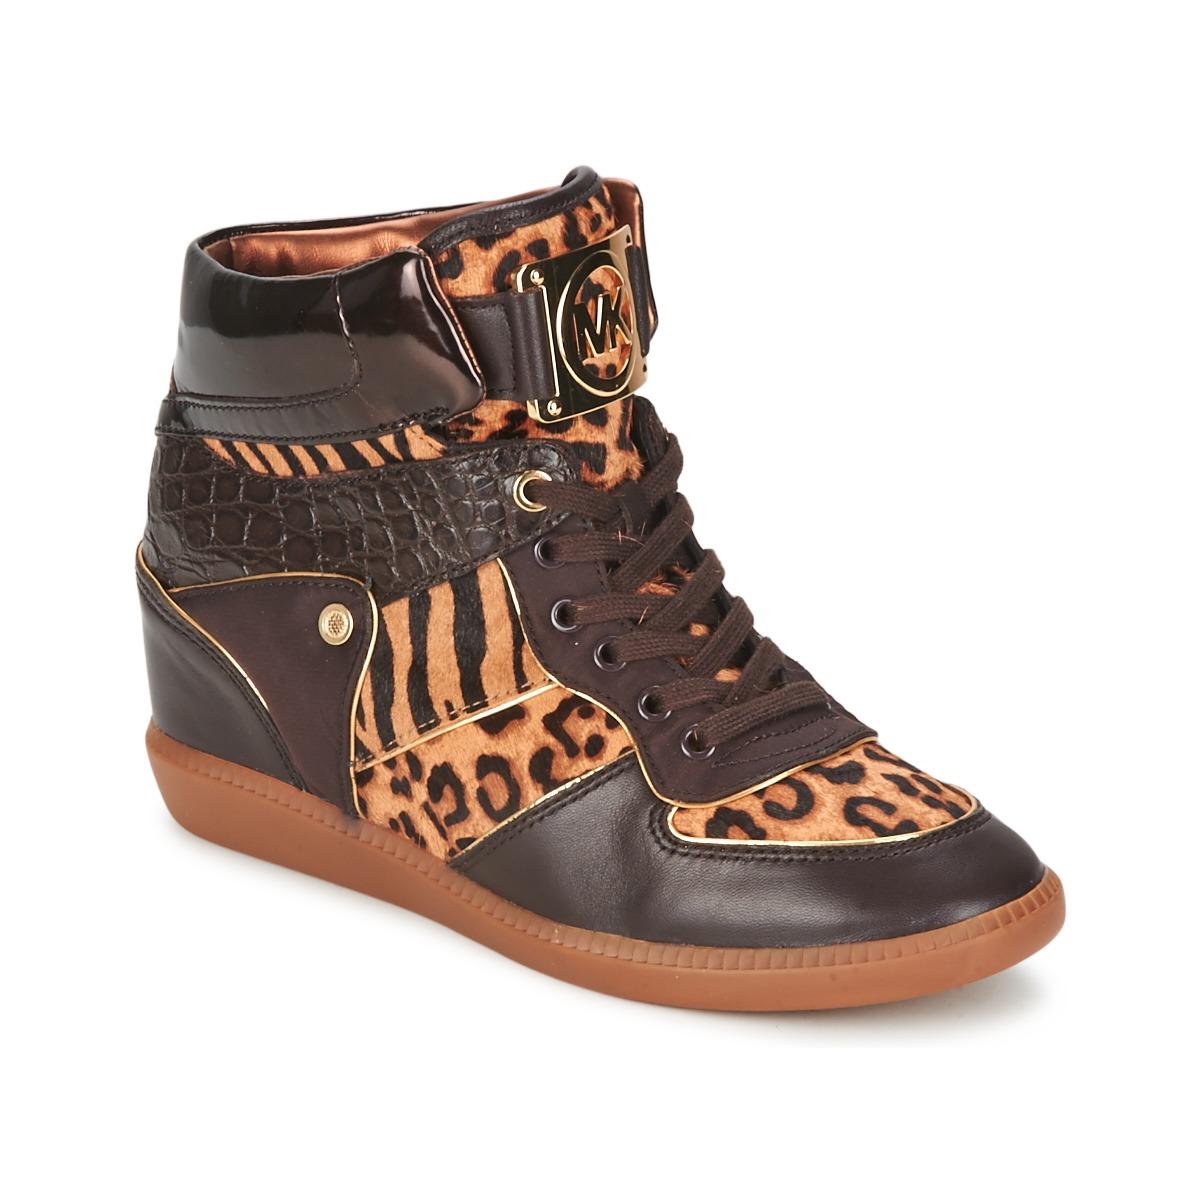 Sur Femme Compensées Iziva Compensées Femme Compensées Chaussures Chaussures Sur Chaussures Femme Iziva P8wkn0O